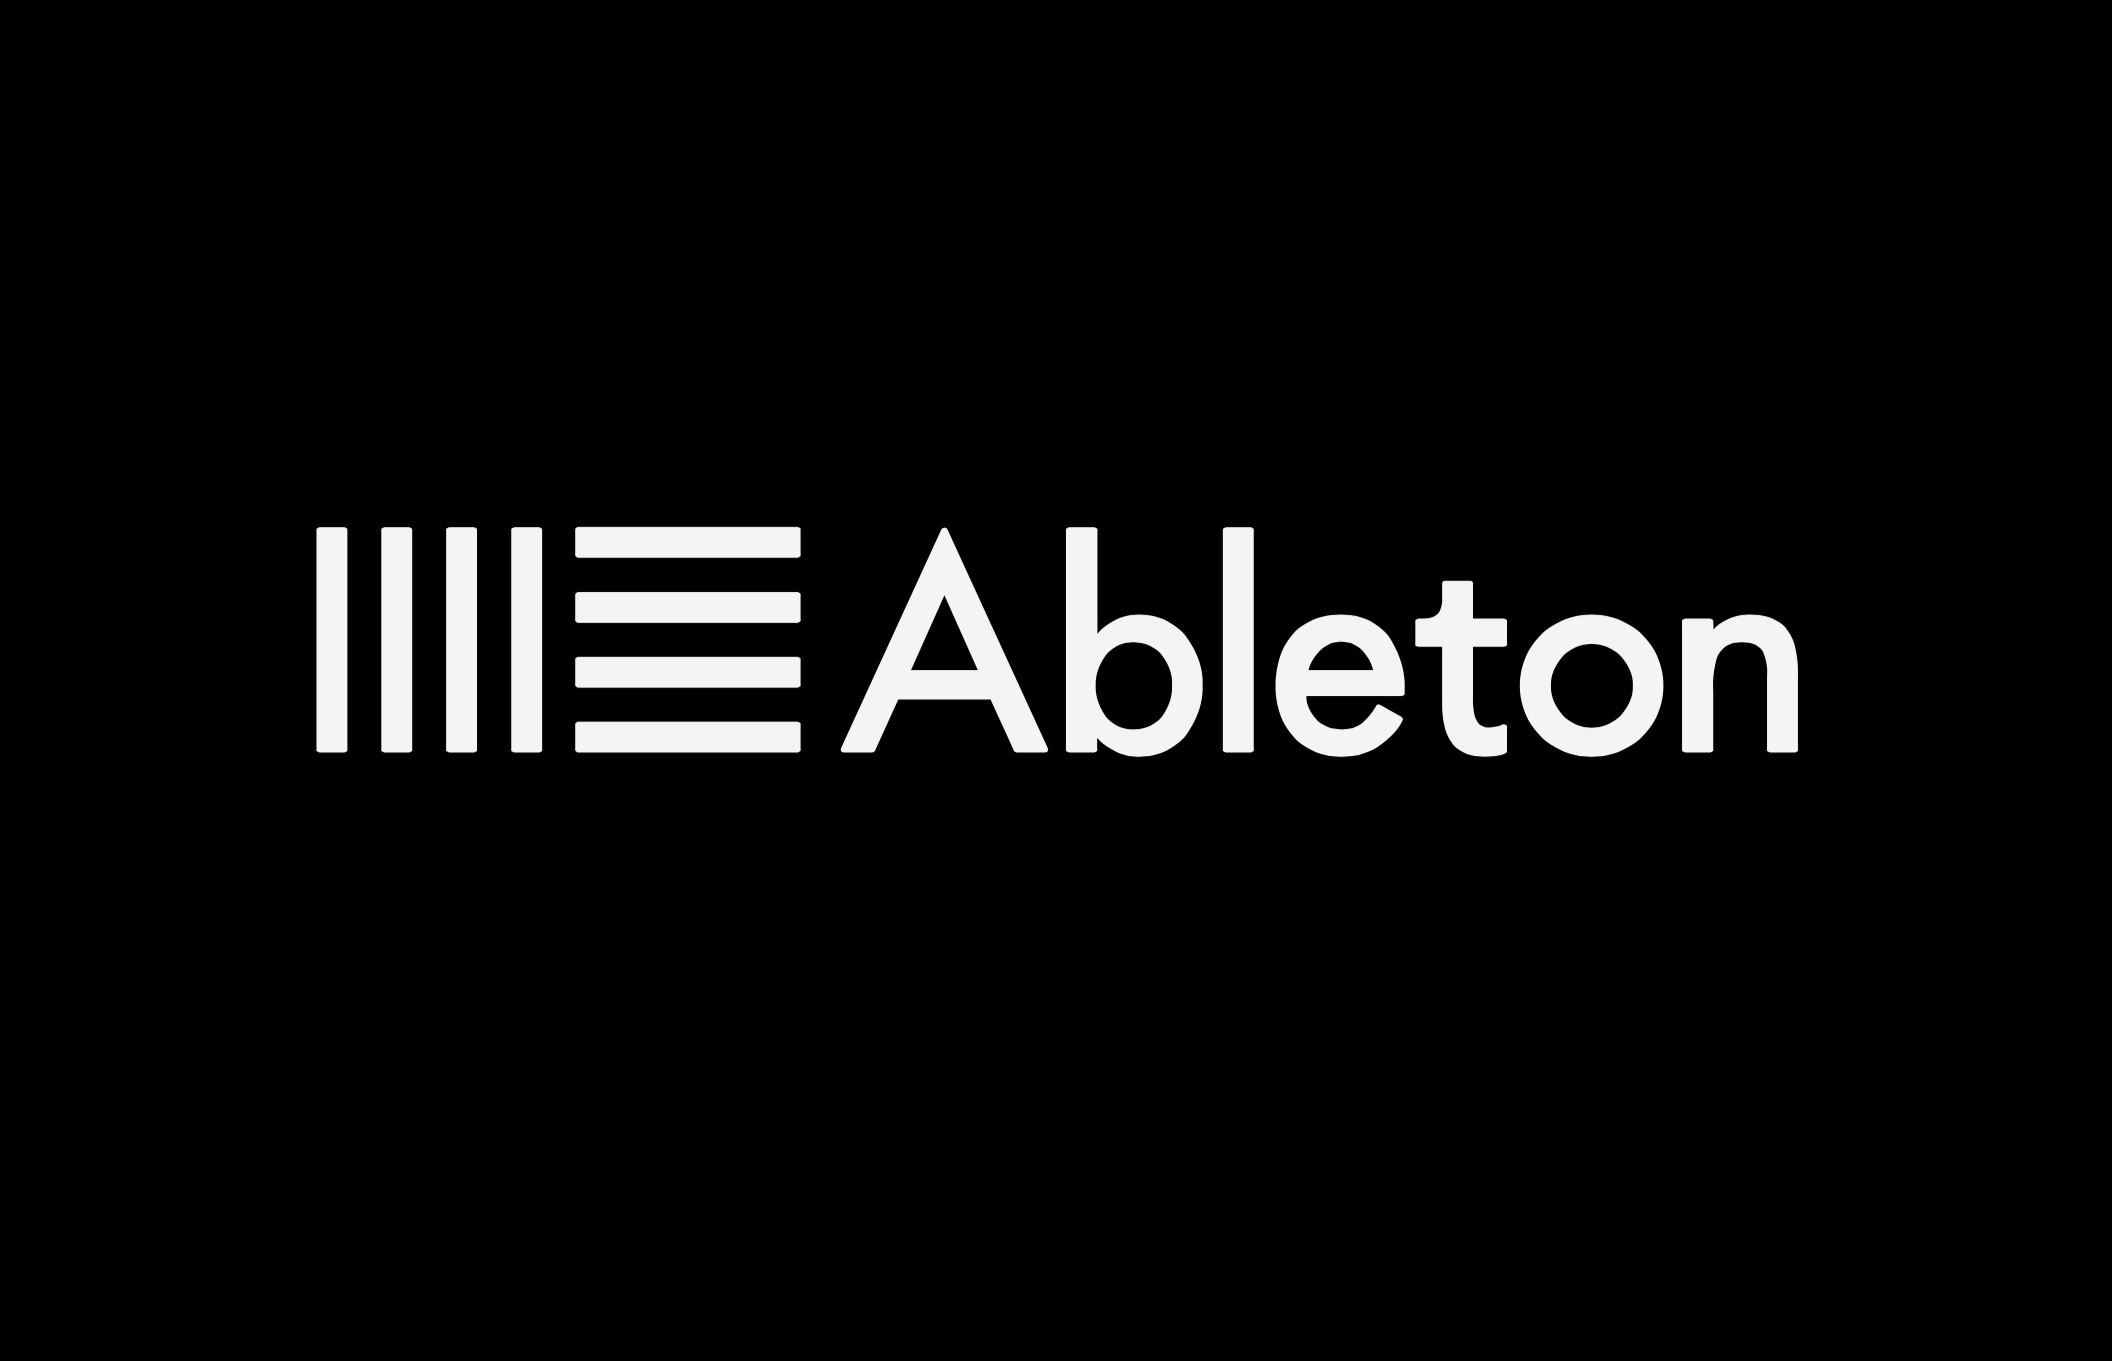 ableton-logo.jpg